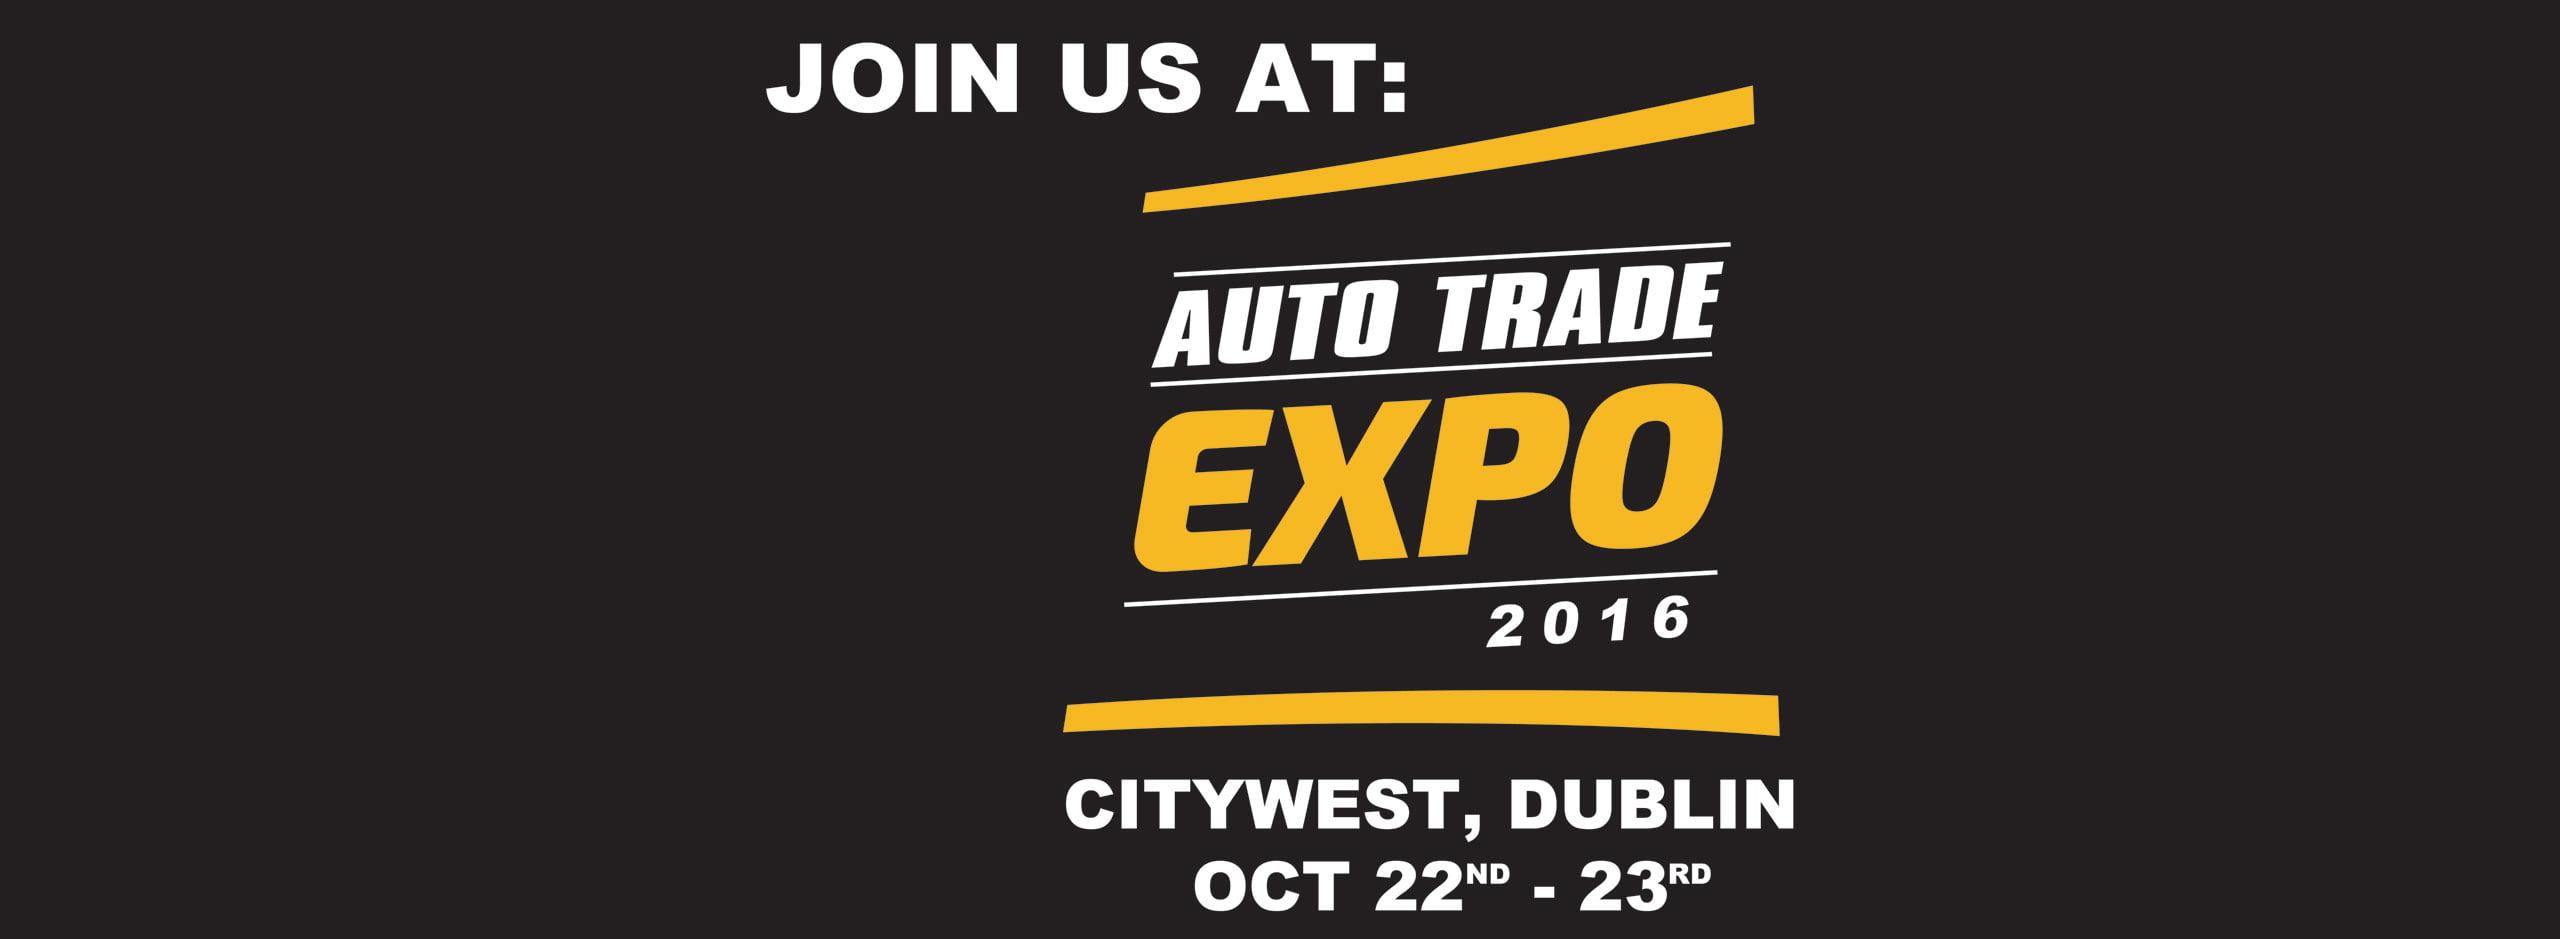 auto_trade_expo